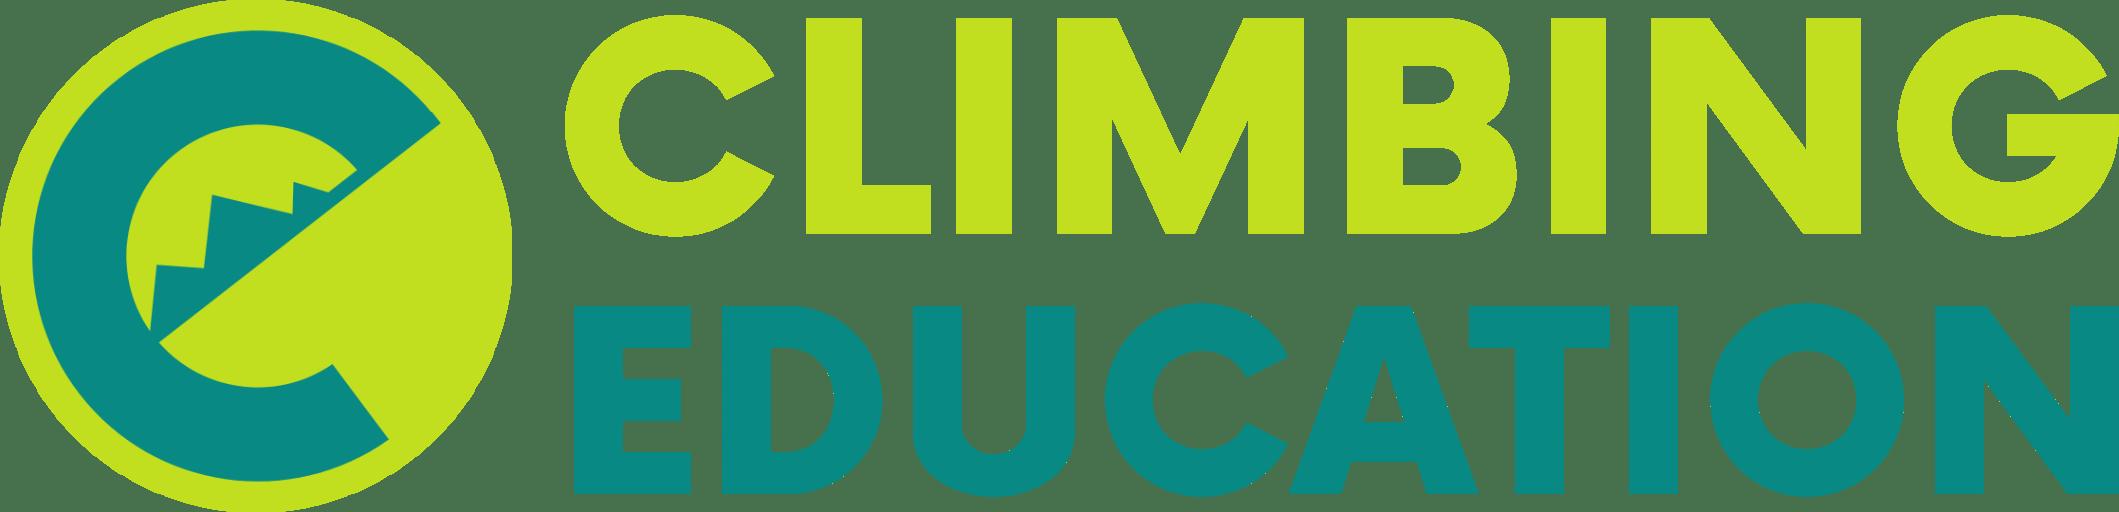 Climbing Education Szkoła Wspinania Mateusz Czempiel